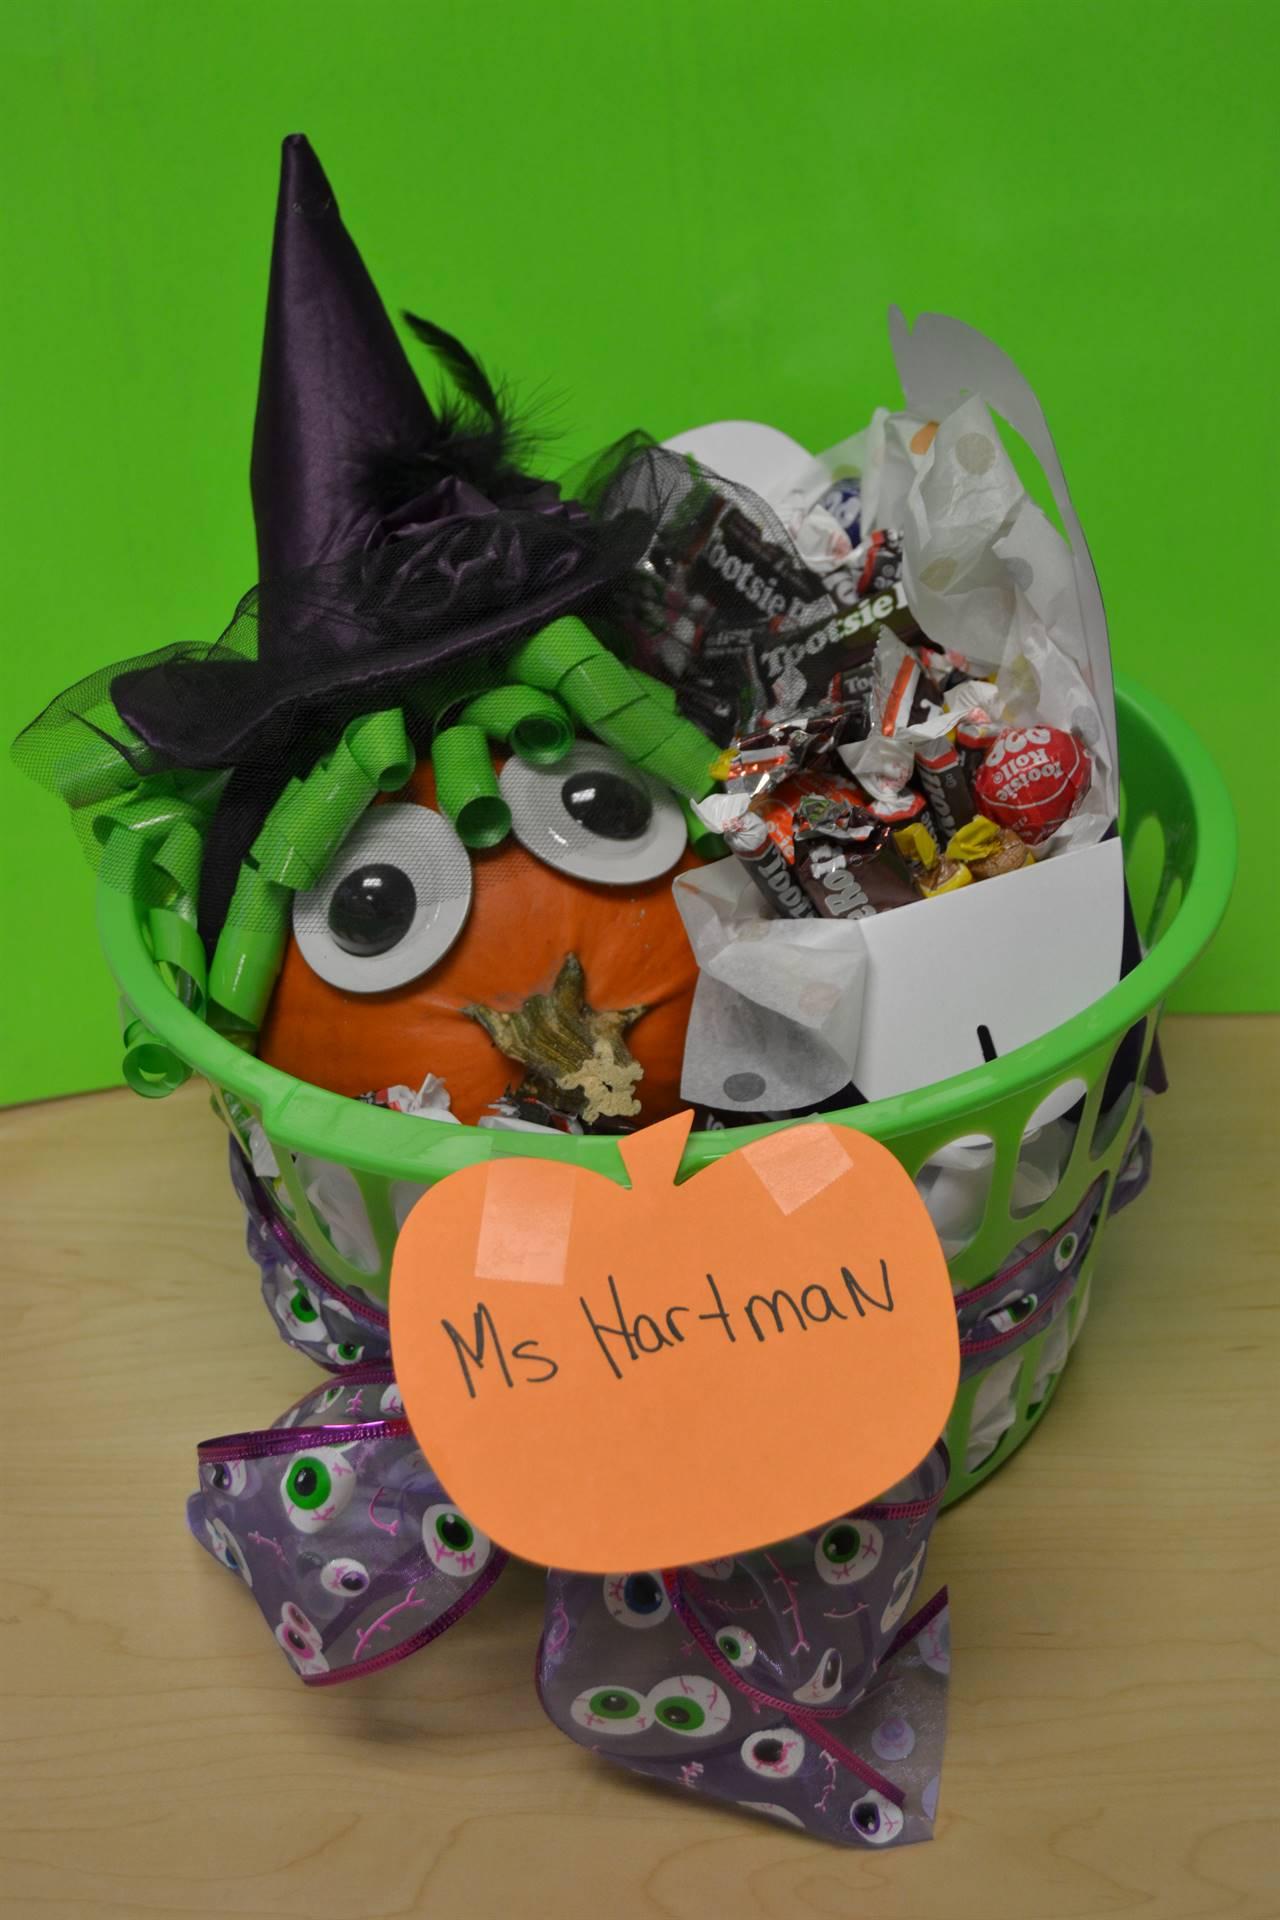 Pumpkin created by Ms. Hartman